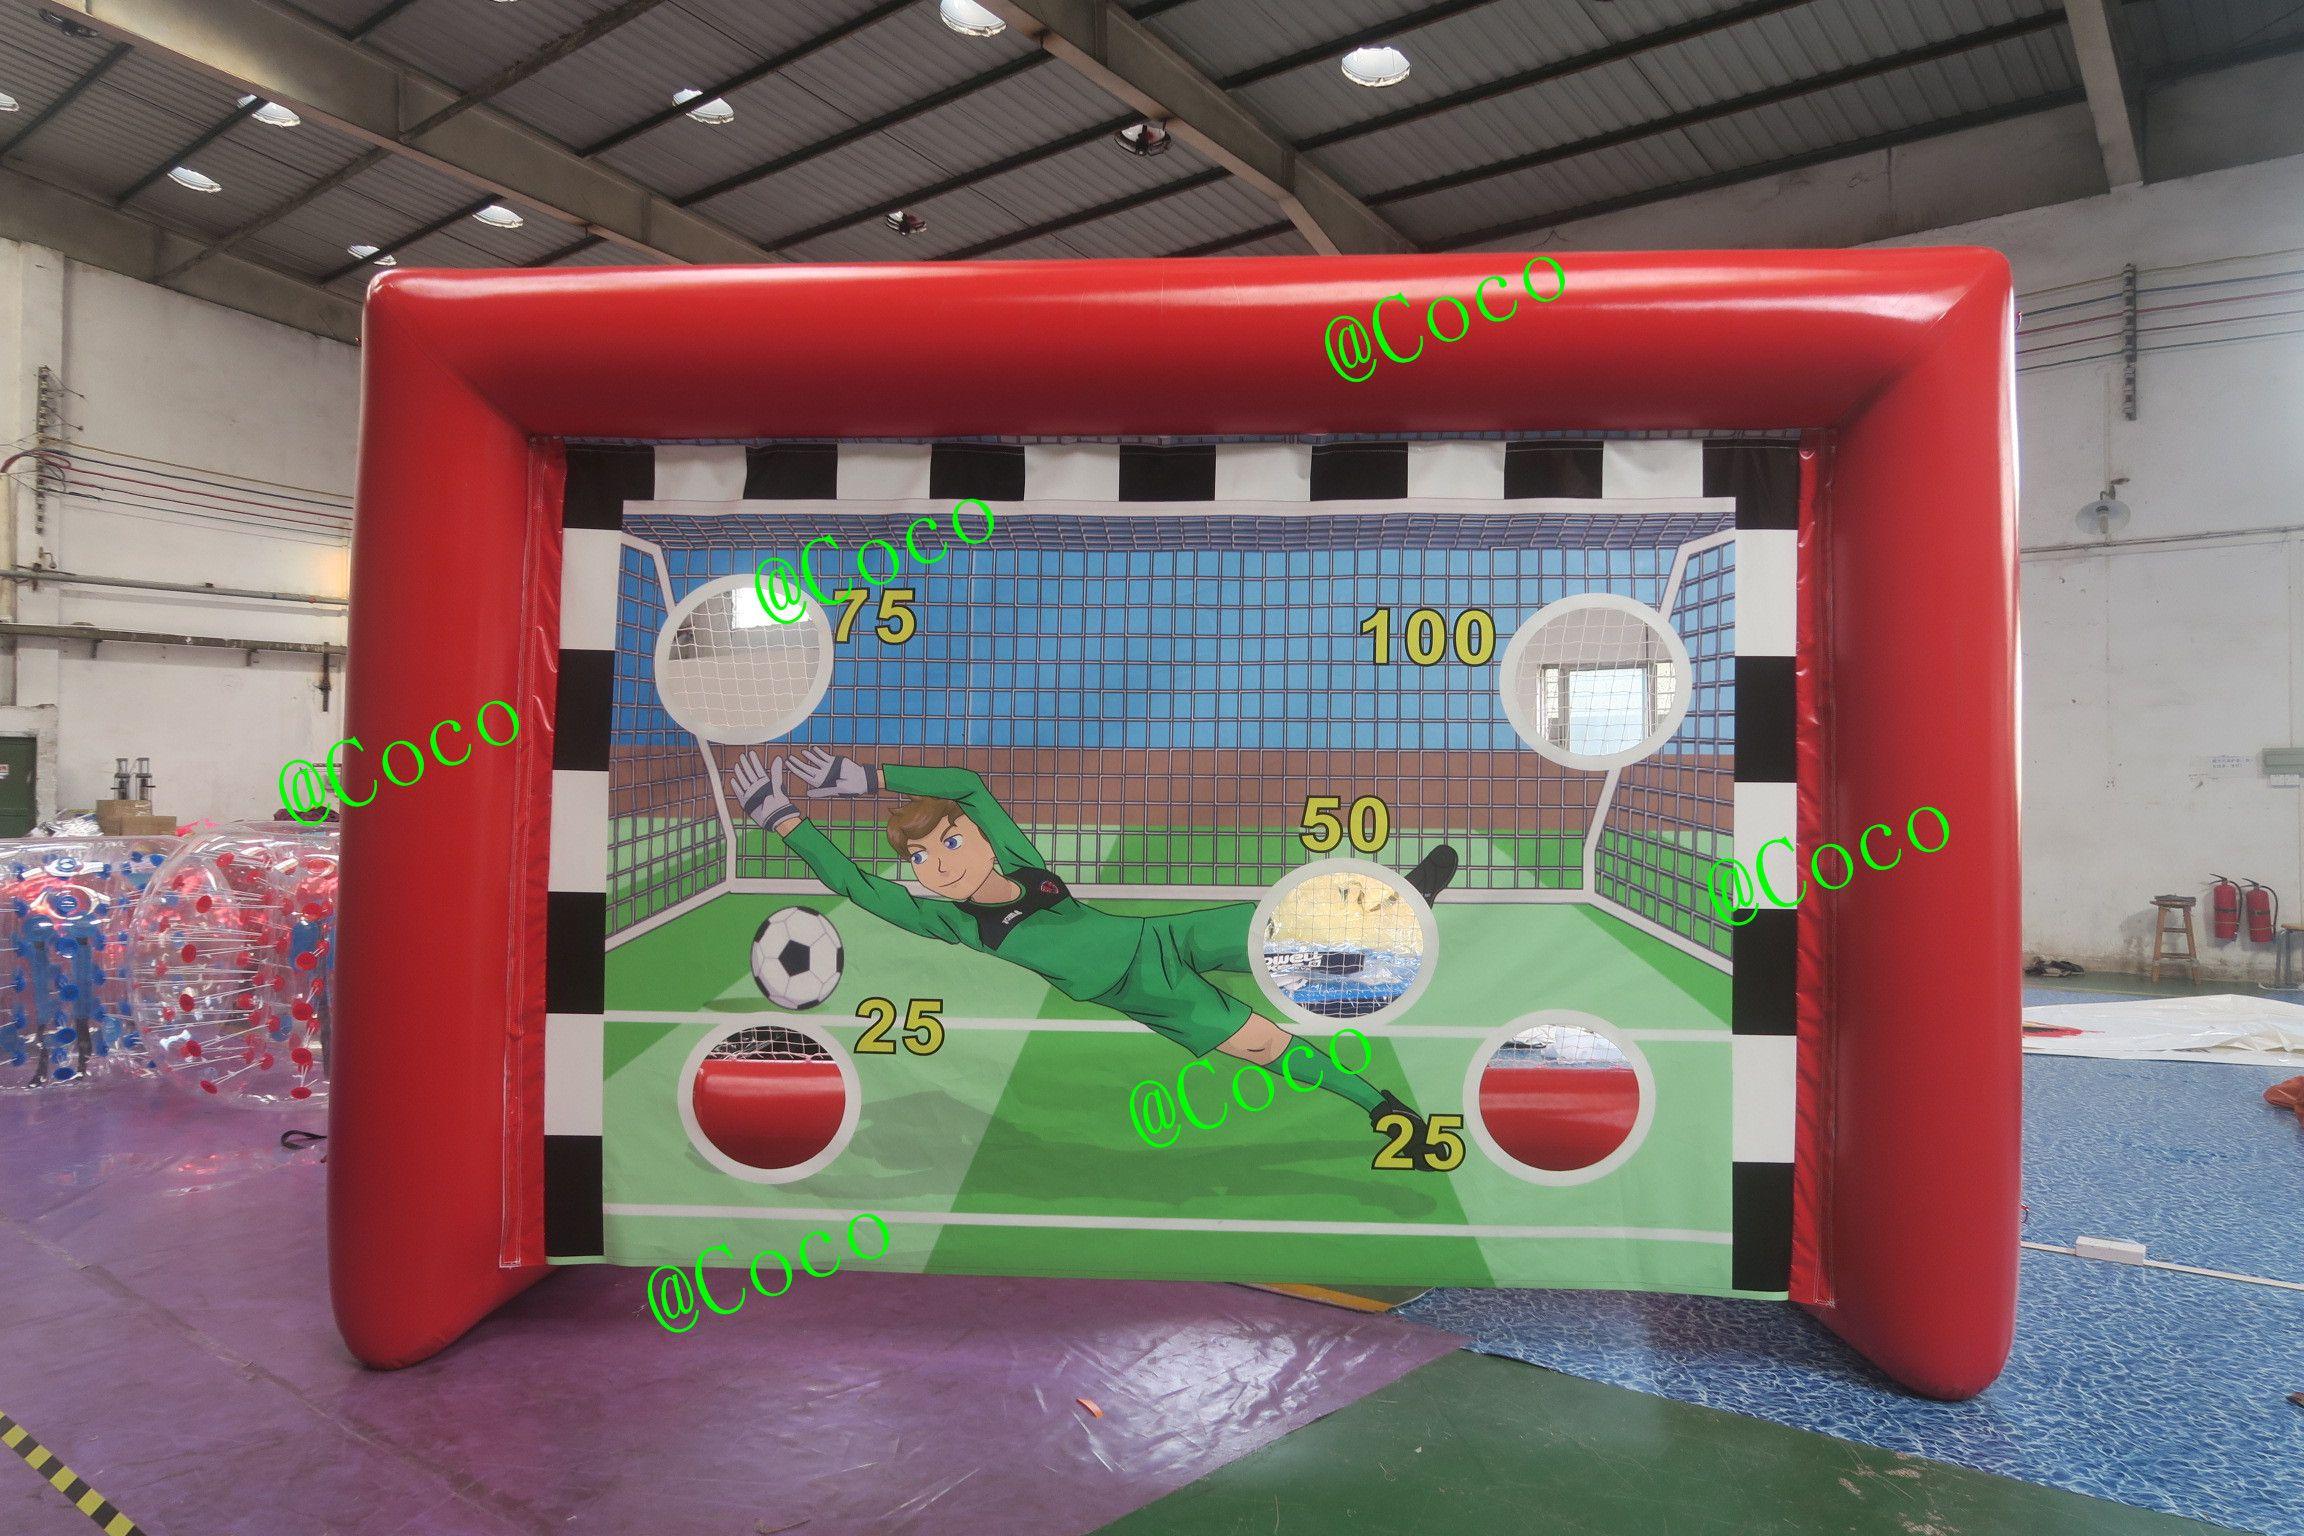 Soccer Goals For Sale >> Inflatable Soccer Kick Shooting Games For Sale Inflatable Football Goal Cheap Inflatable Soccer Goal